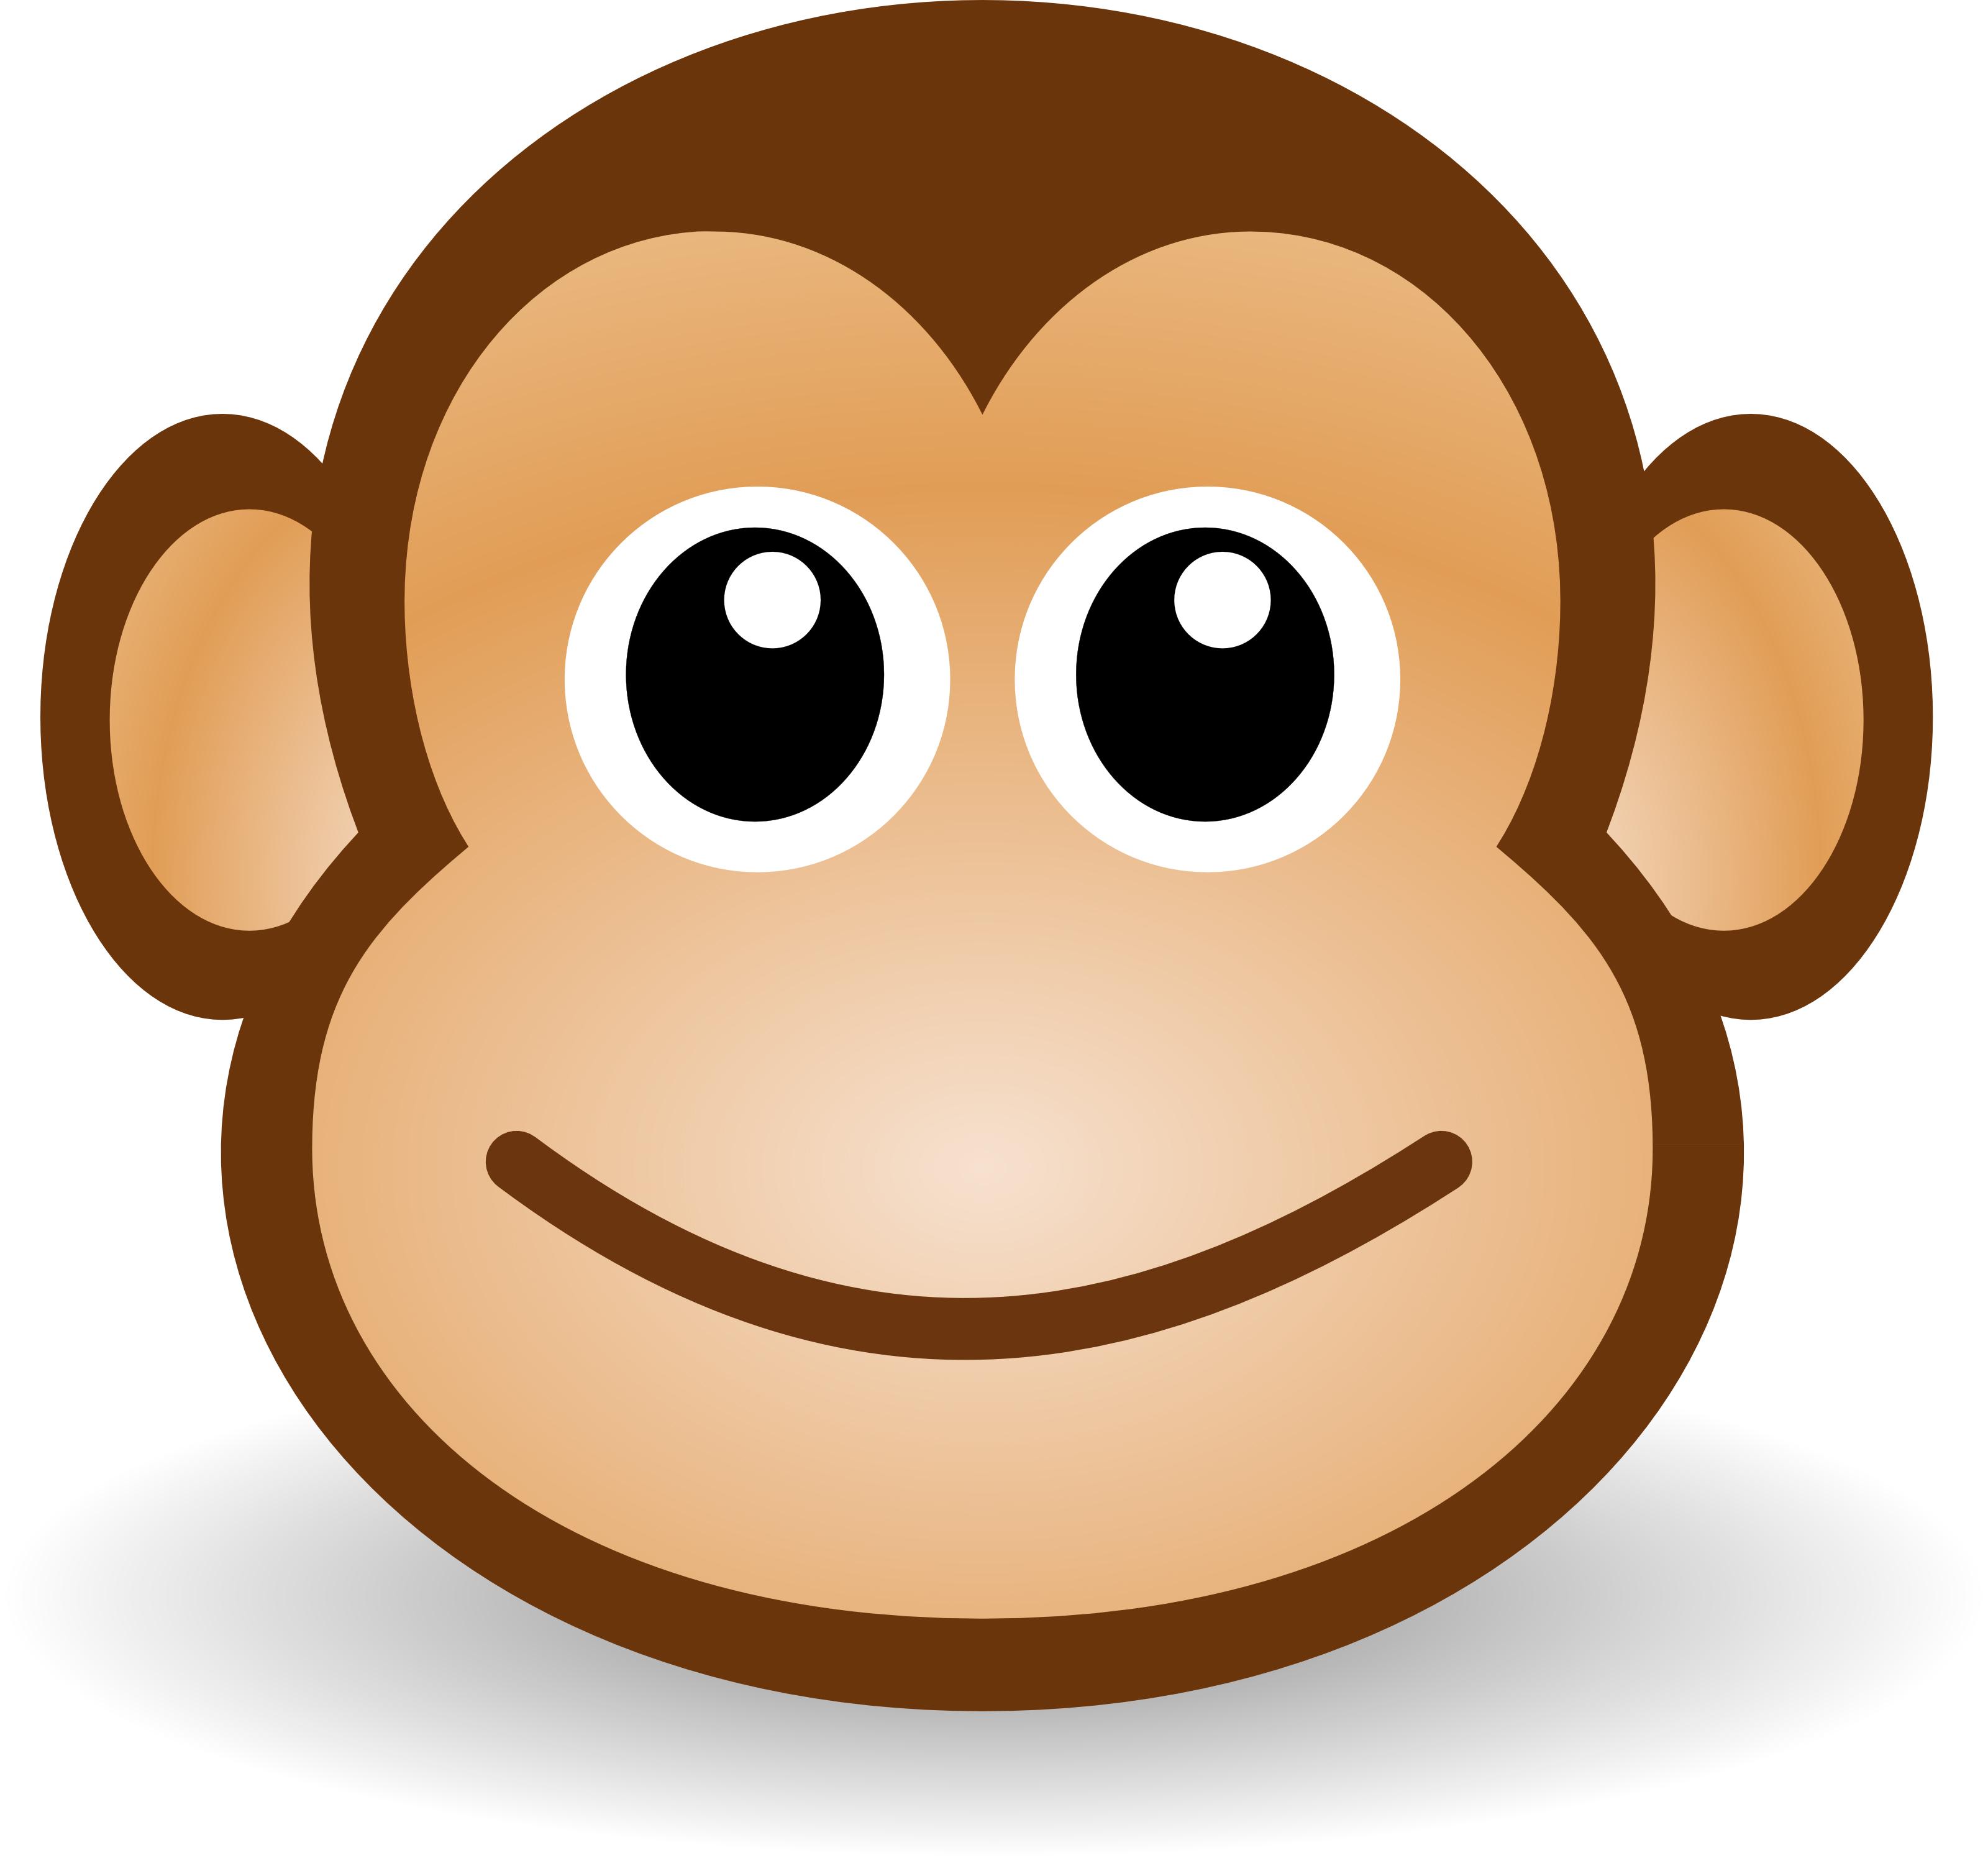 3200x2990 Cute Cartoon Monkey Clipart Illustration